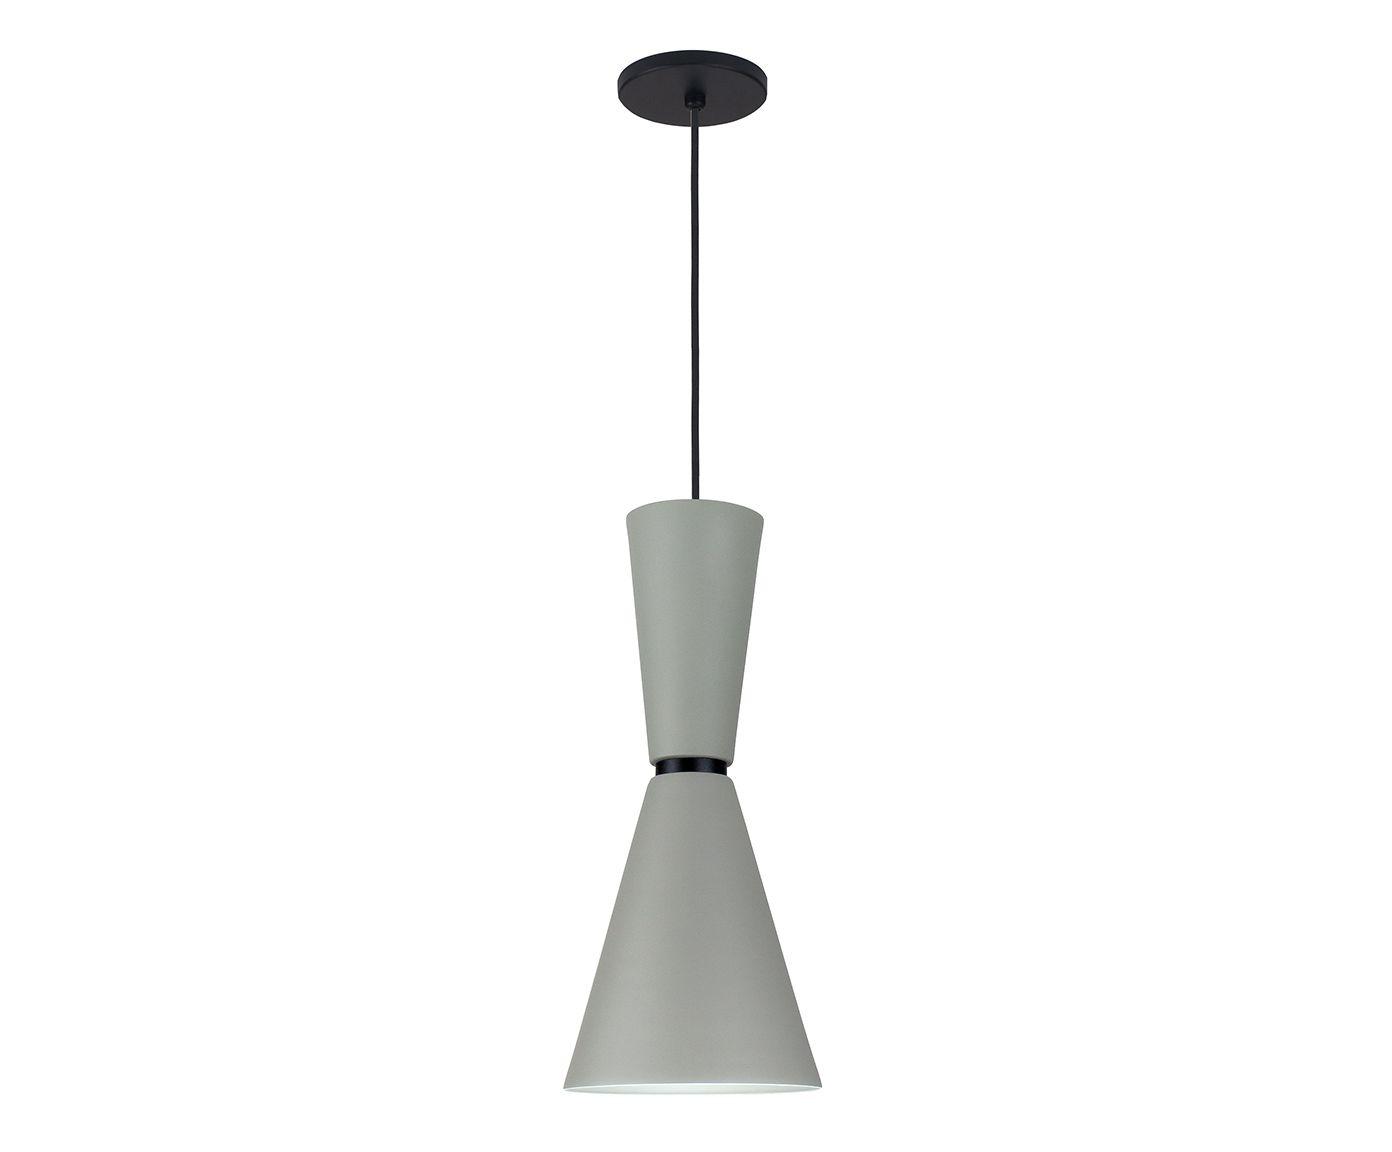 Pendente Bambola Bivolt - 41,5X18cm | Westwing.com.br